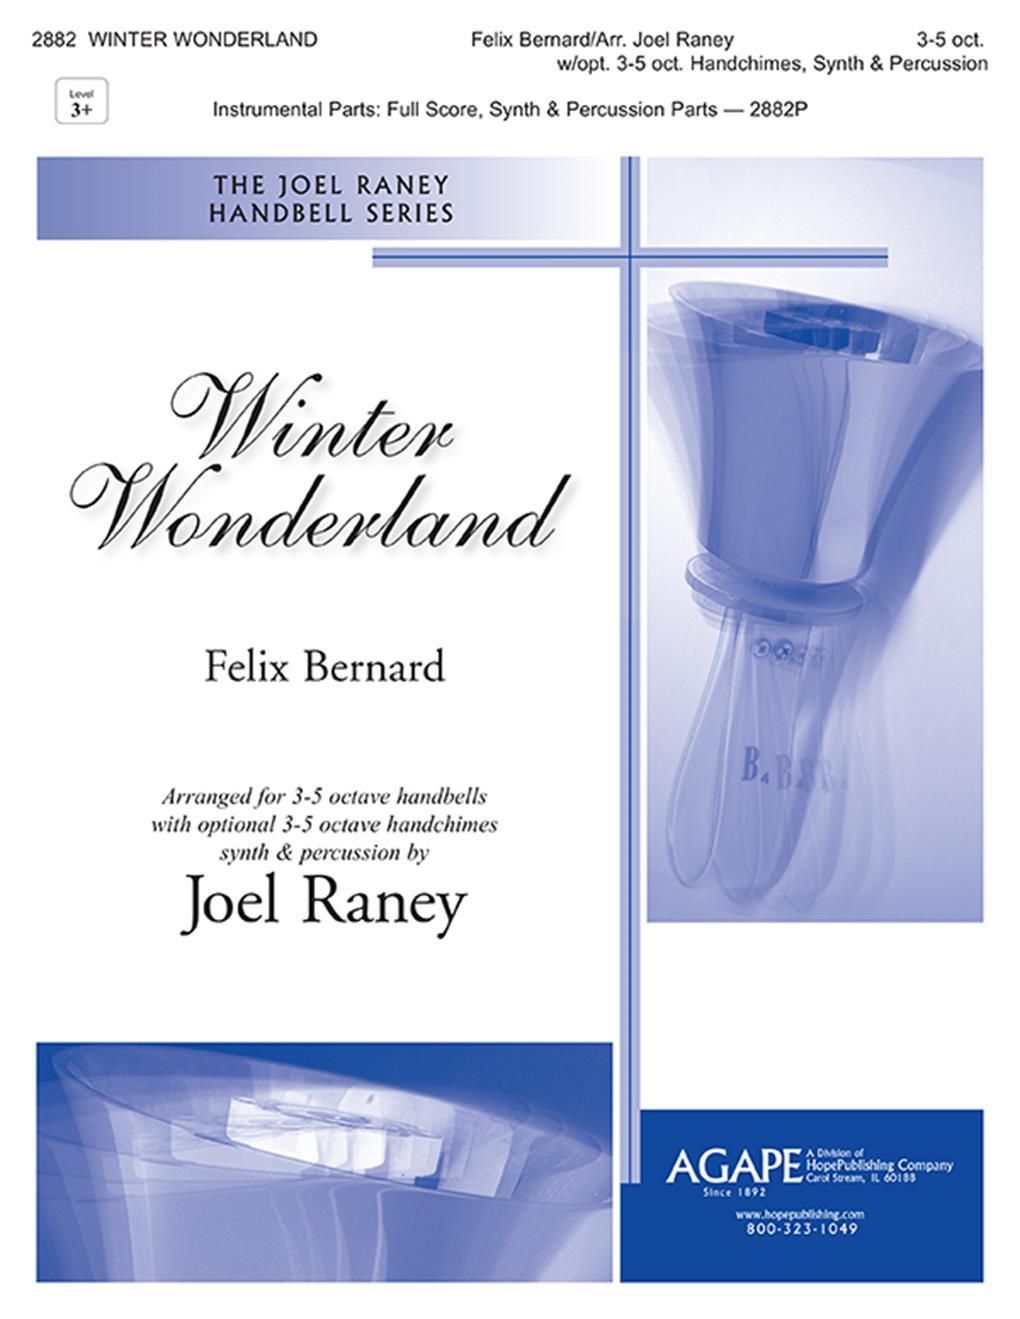 Winter Wonderland - 3-5 Oct. Cover Image